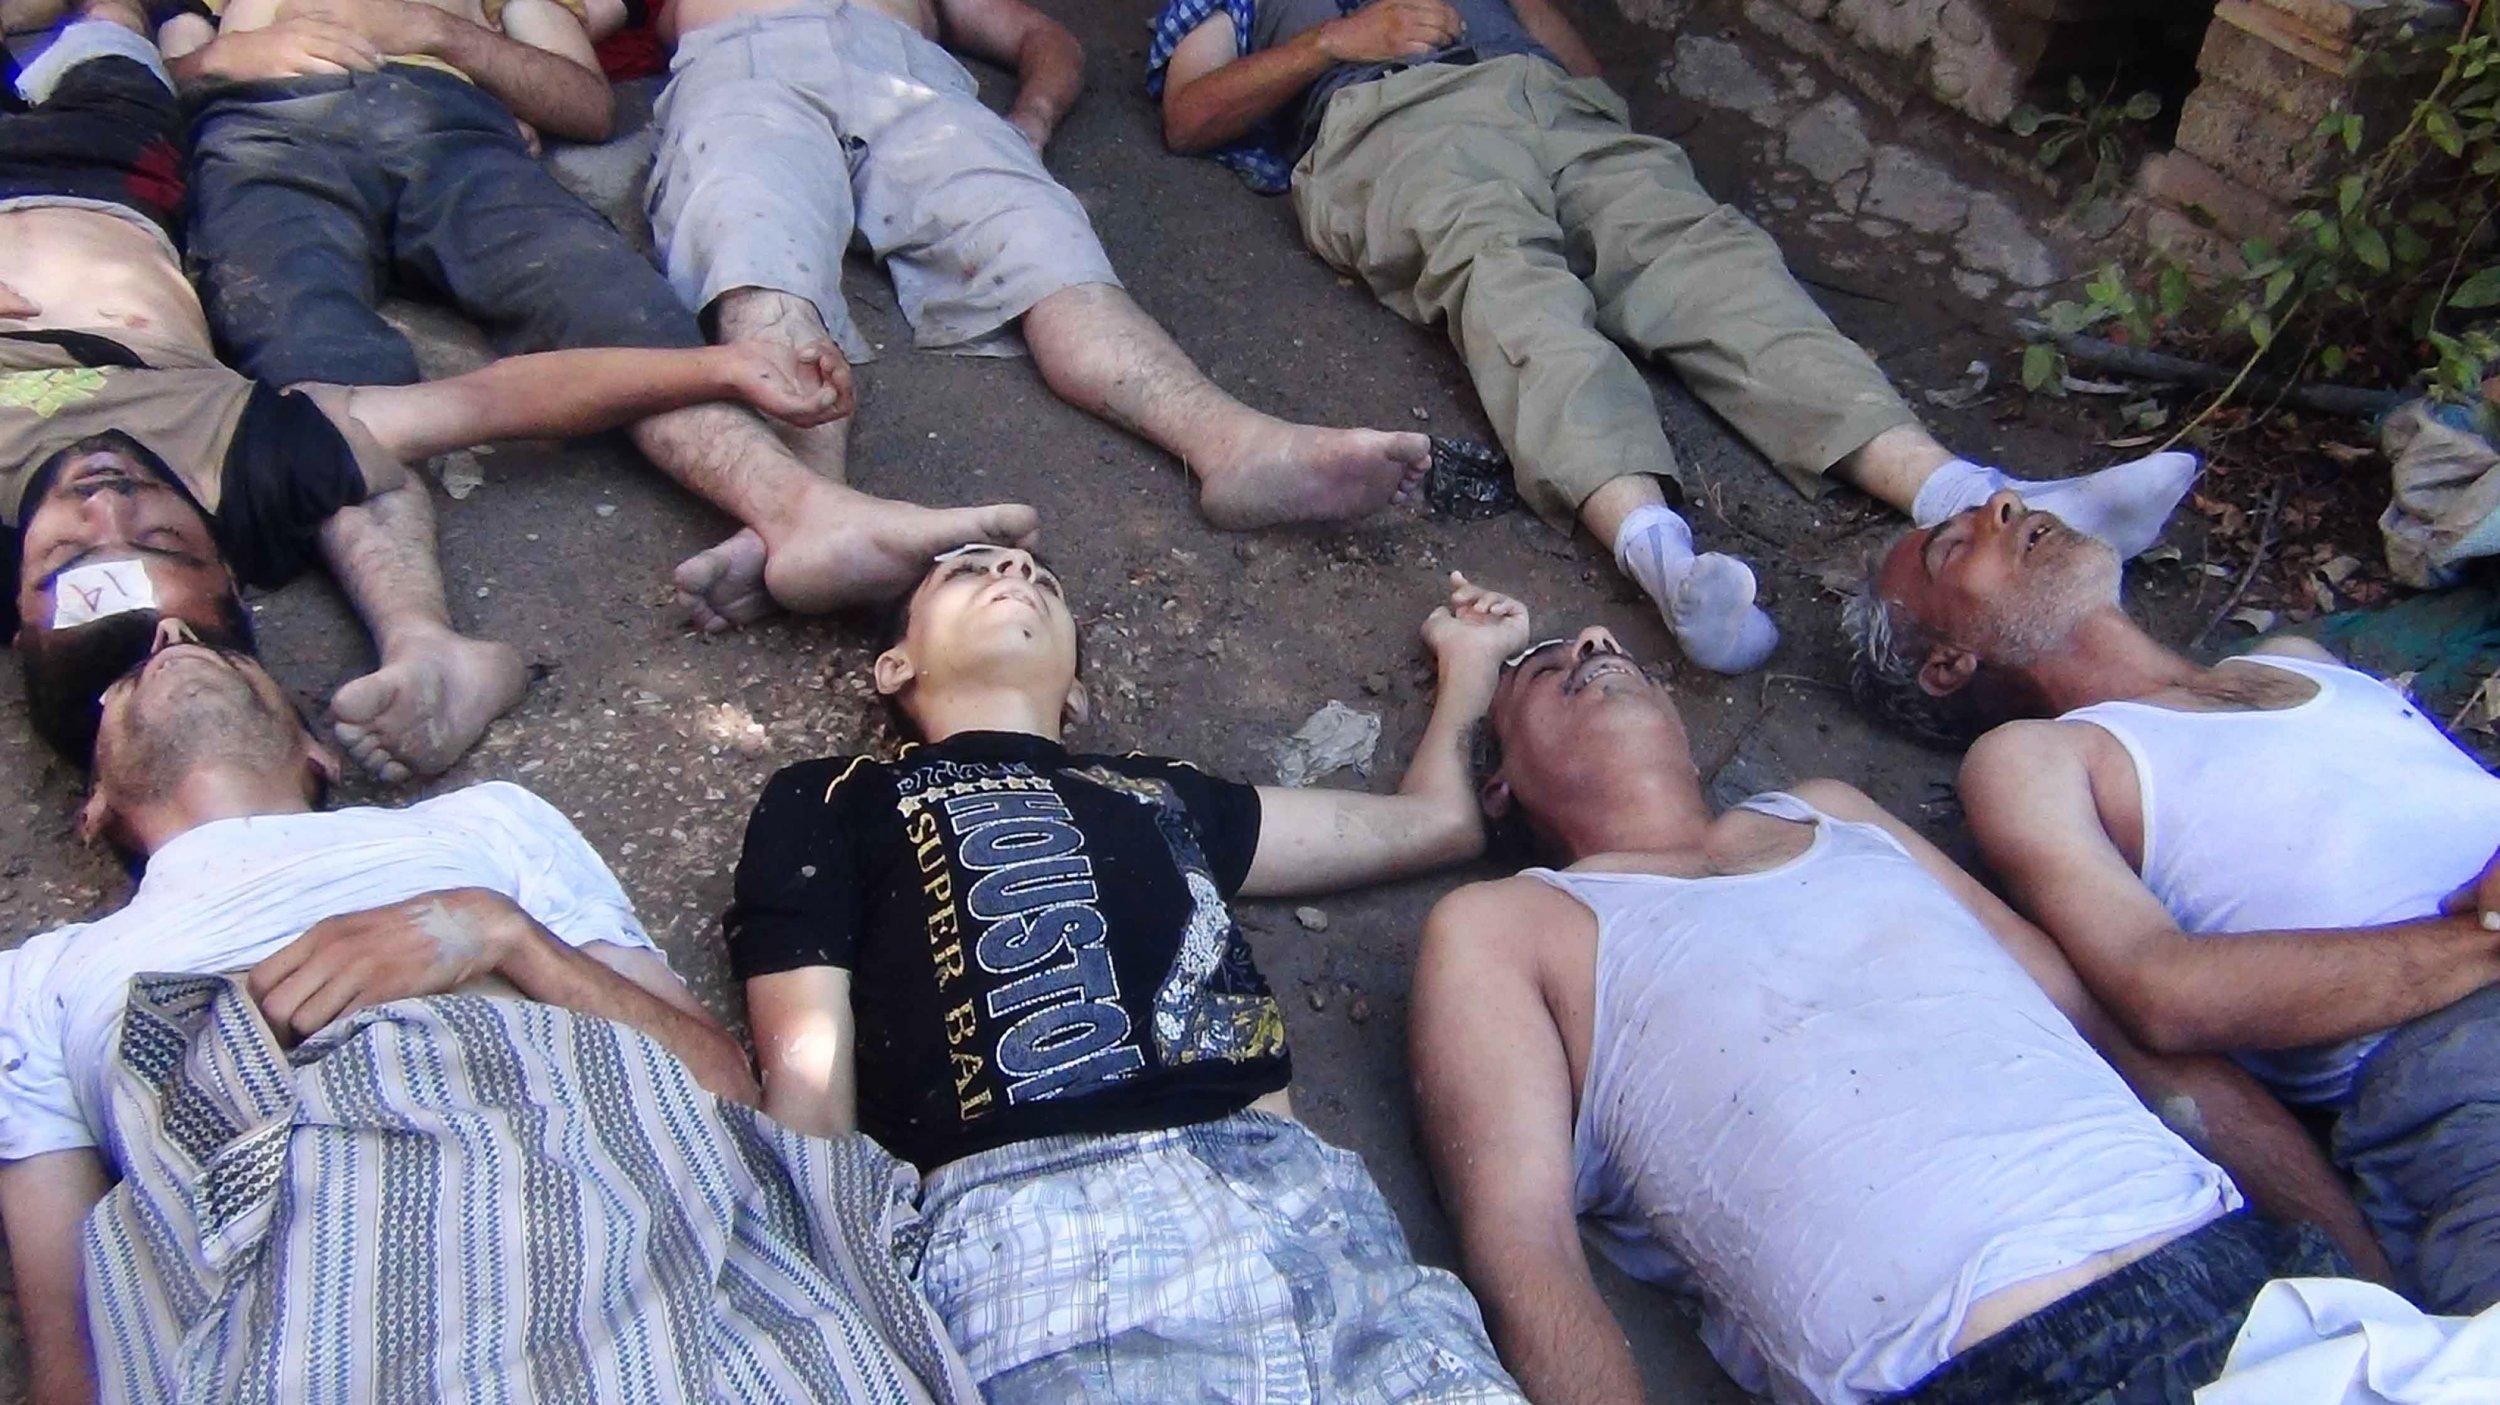 05_04_Assad_Poison_01